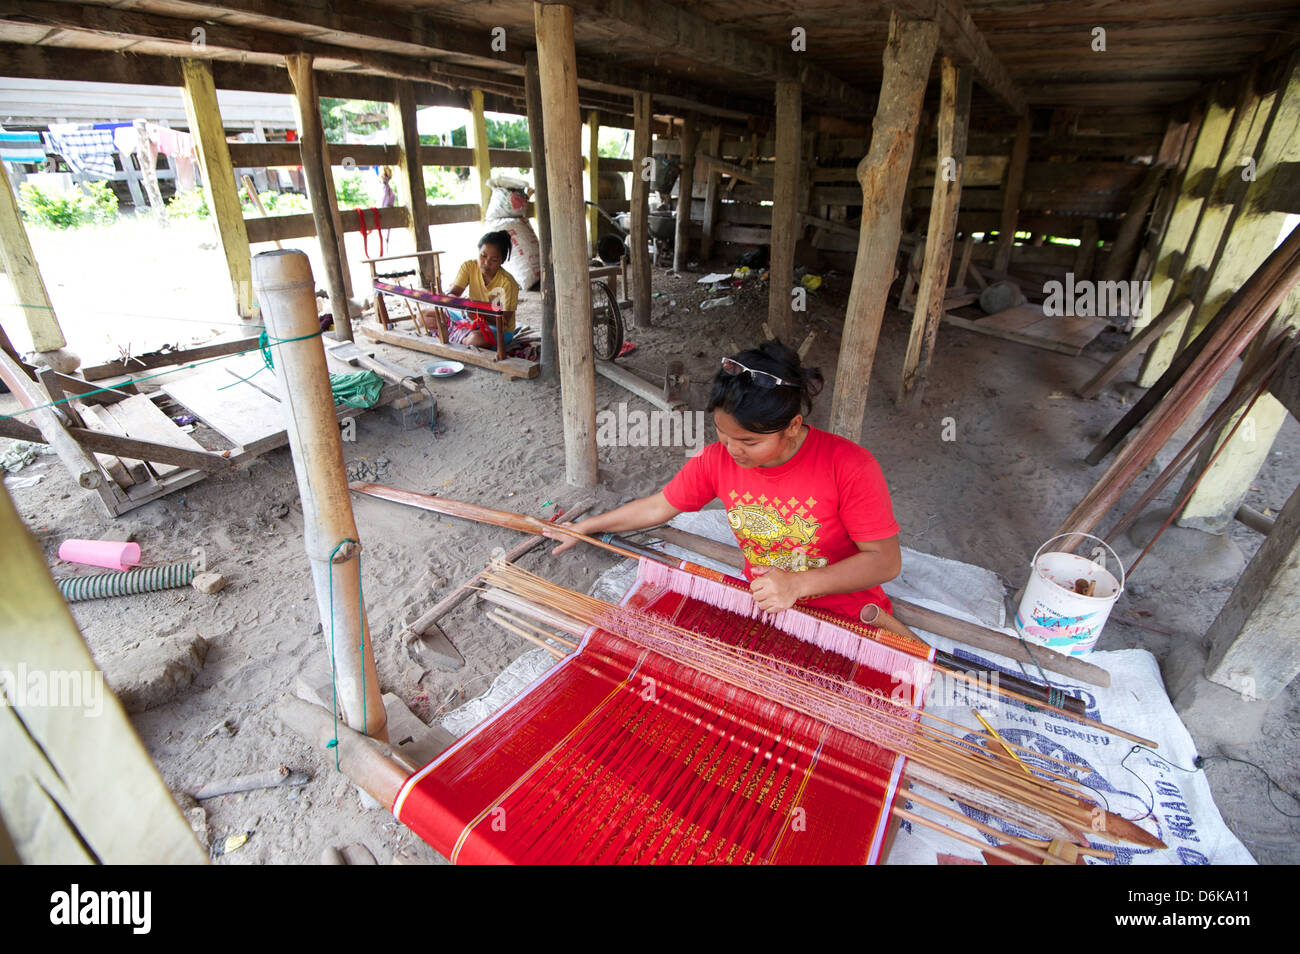 Batak woman weaving Batak Toba sarong beneath her Batak house, Buhit, Samosir Island, Lake Toba, Sumatra, Indonesia Stock Photo